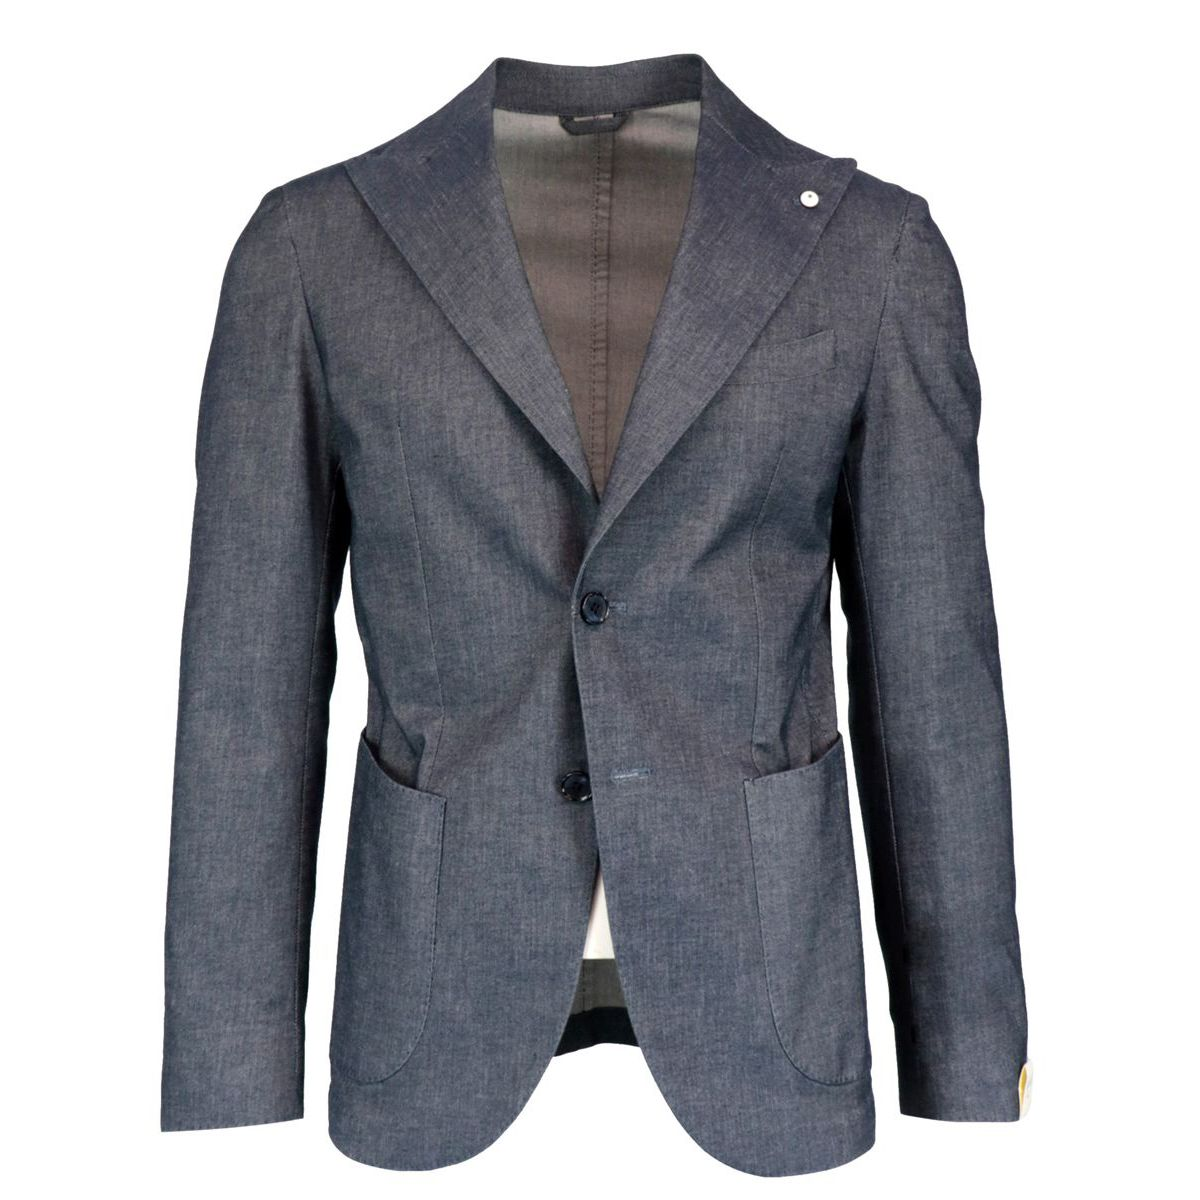 Slim jacket in cotton and stretch linen denim effect Denim L.B.M. 1911